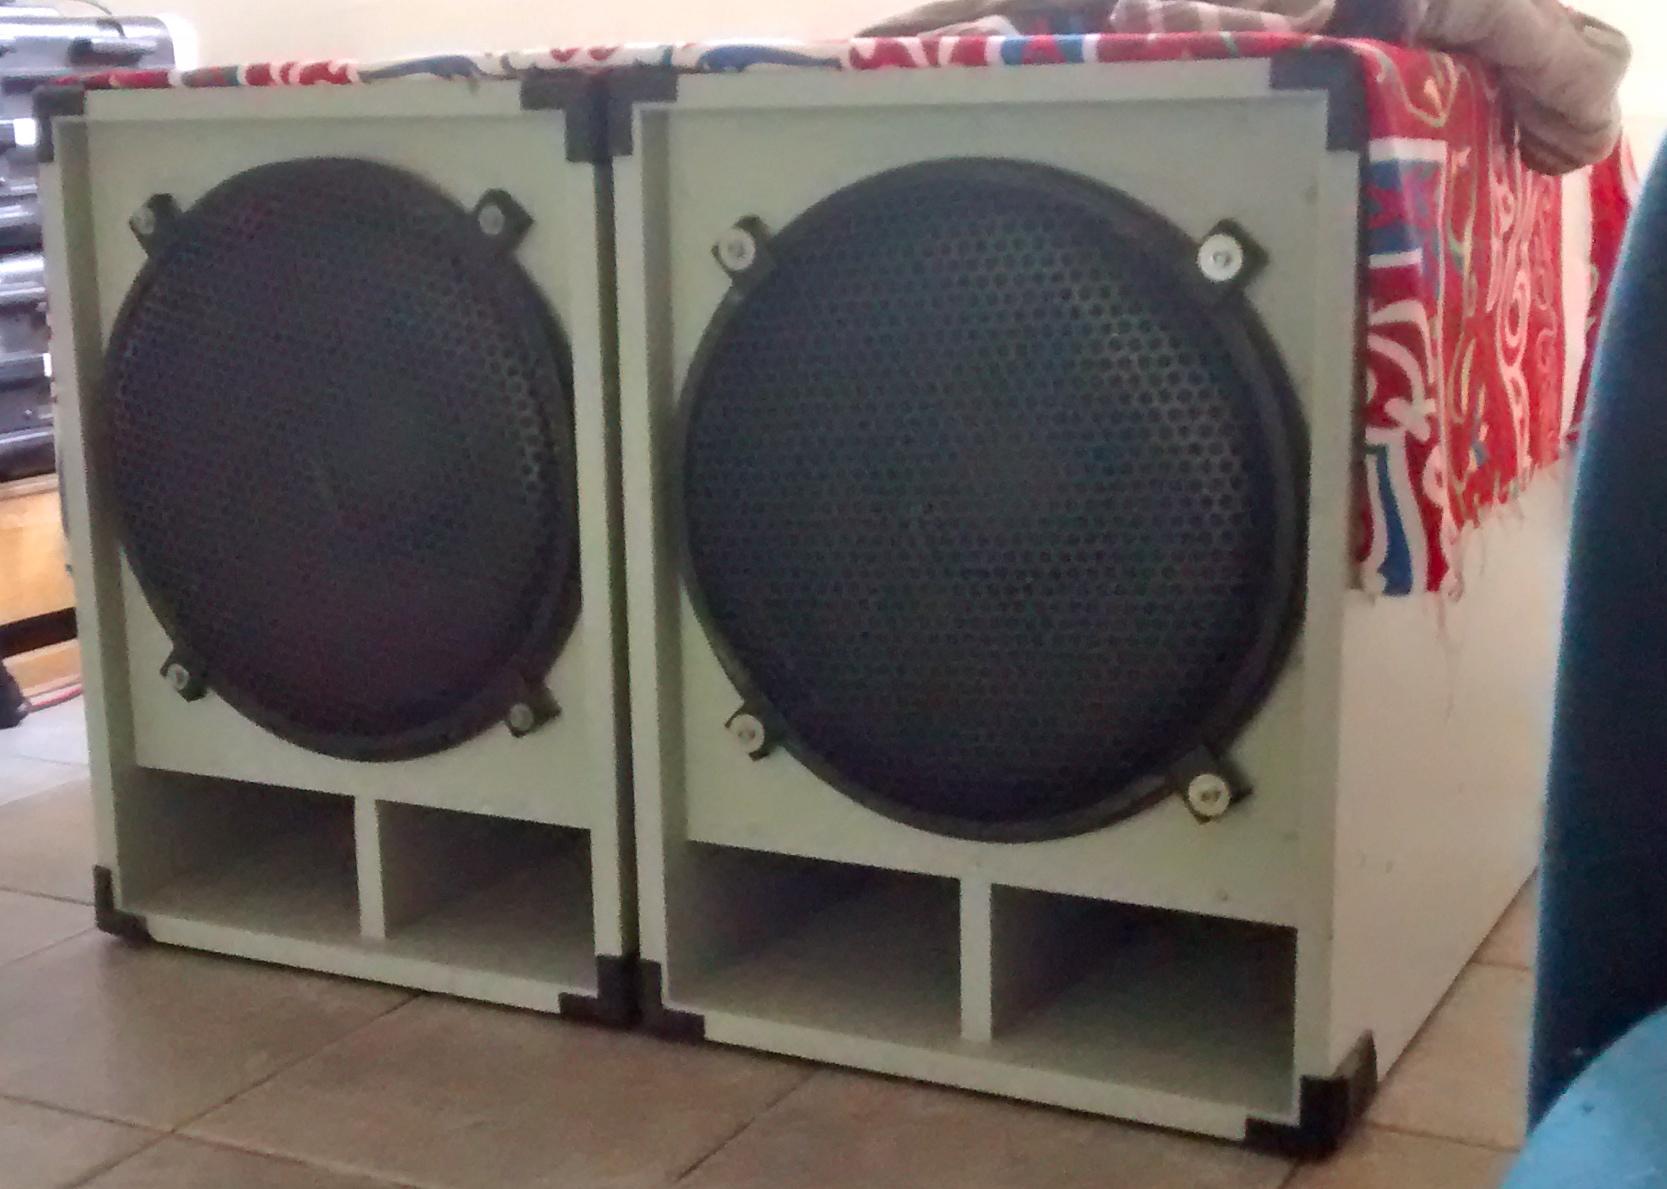 15tbx40 b c speakers 15tbx40 audiofanzine - Fabriquer caisson de basse ...